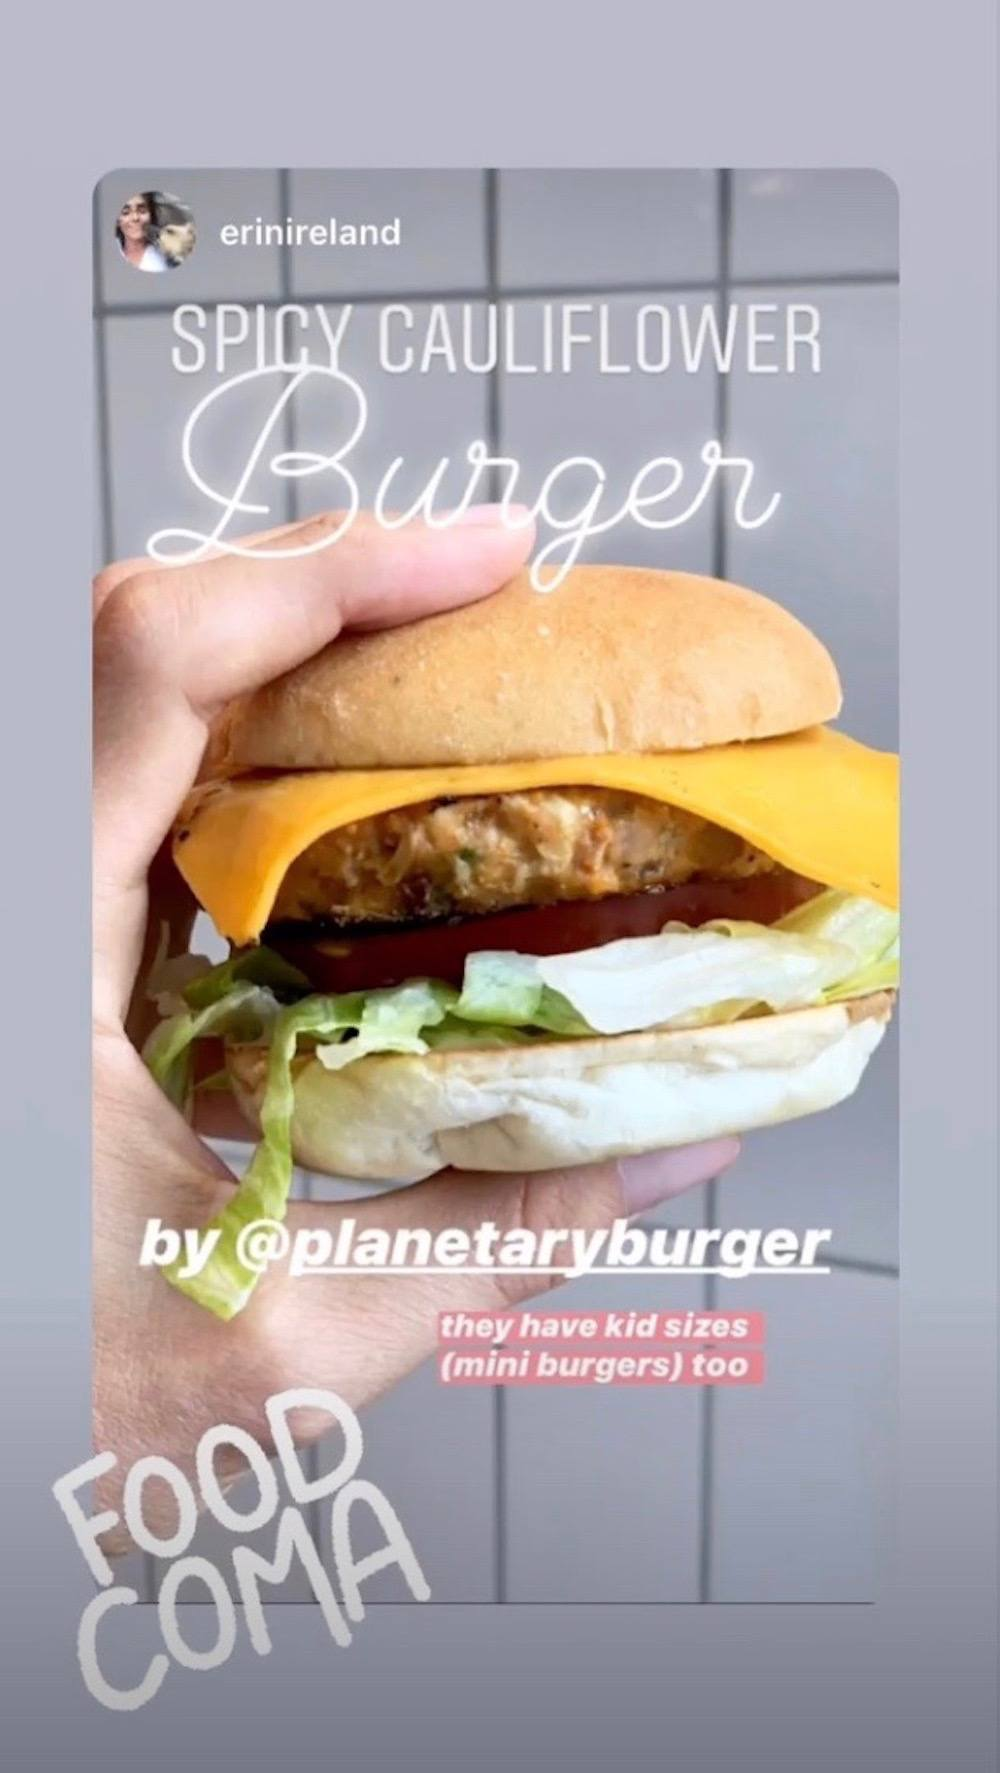 Planetary Burger